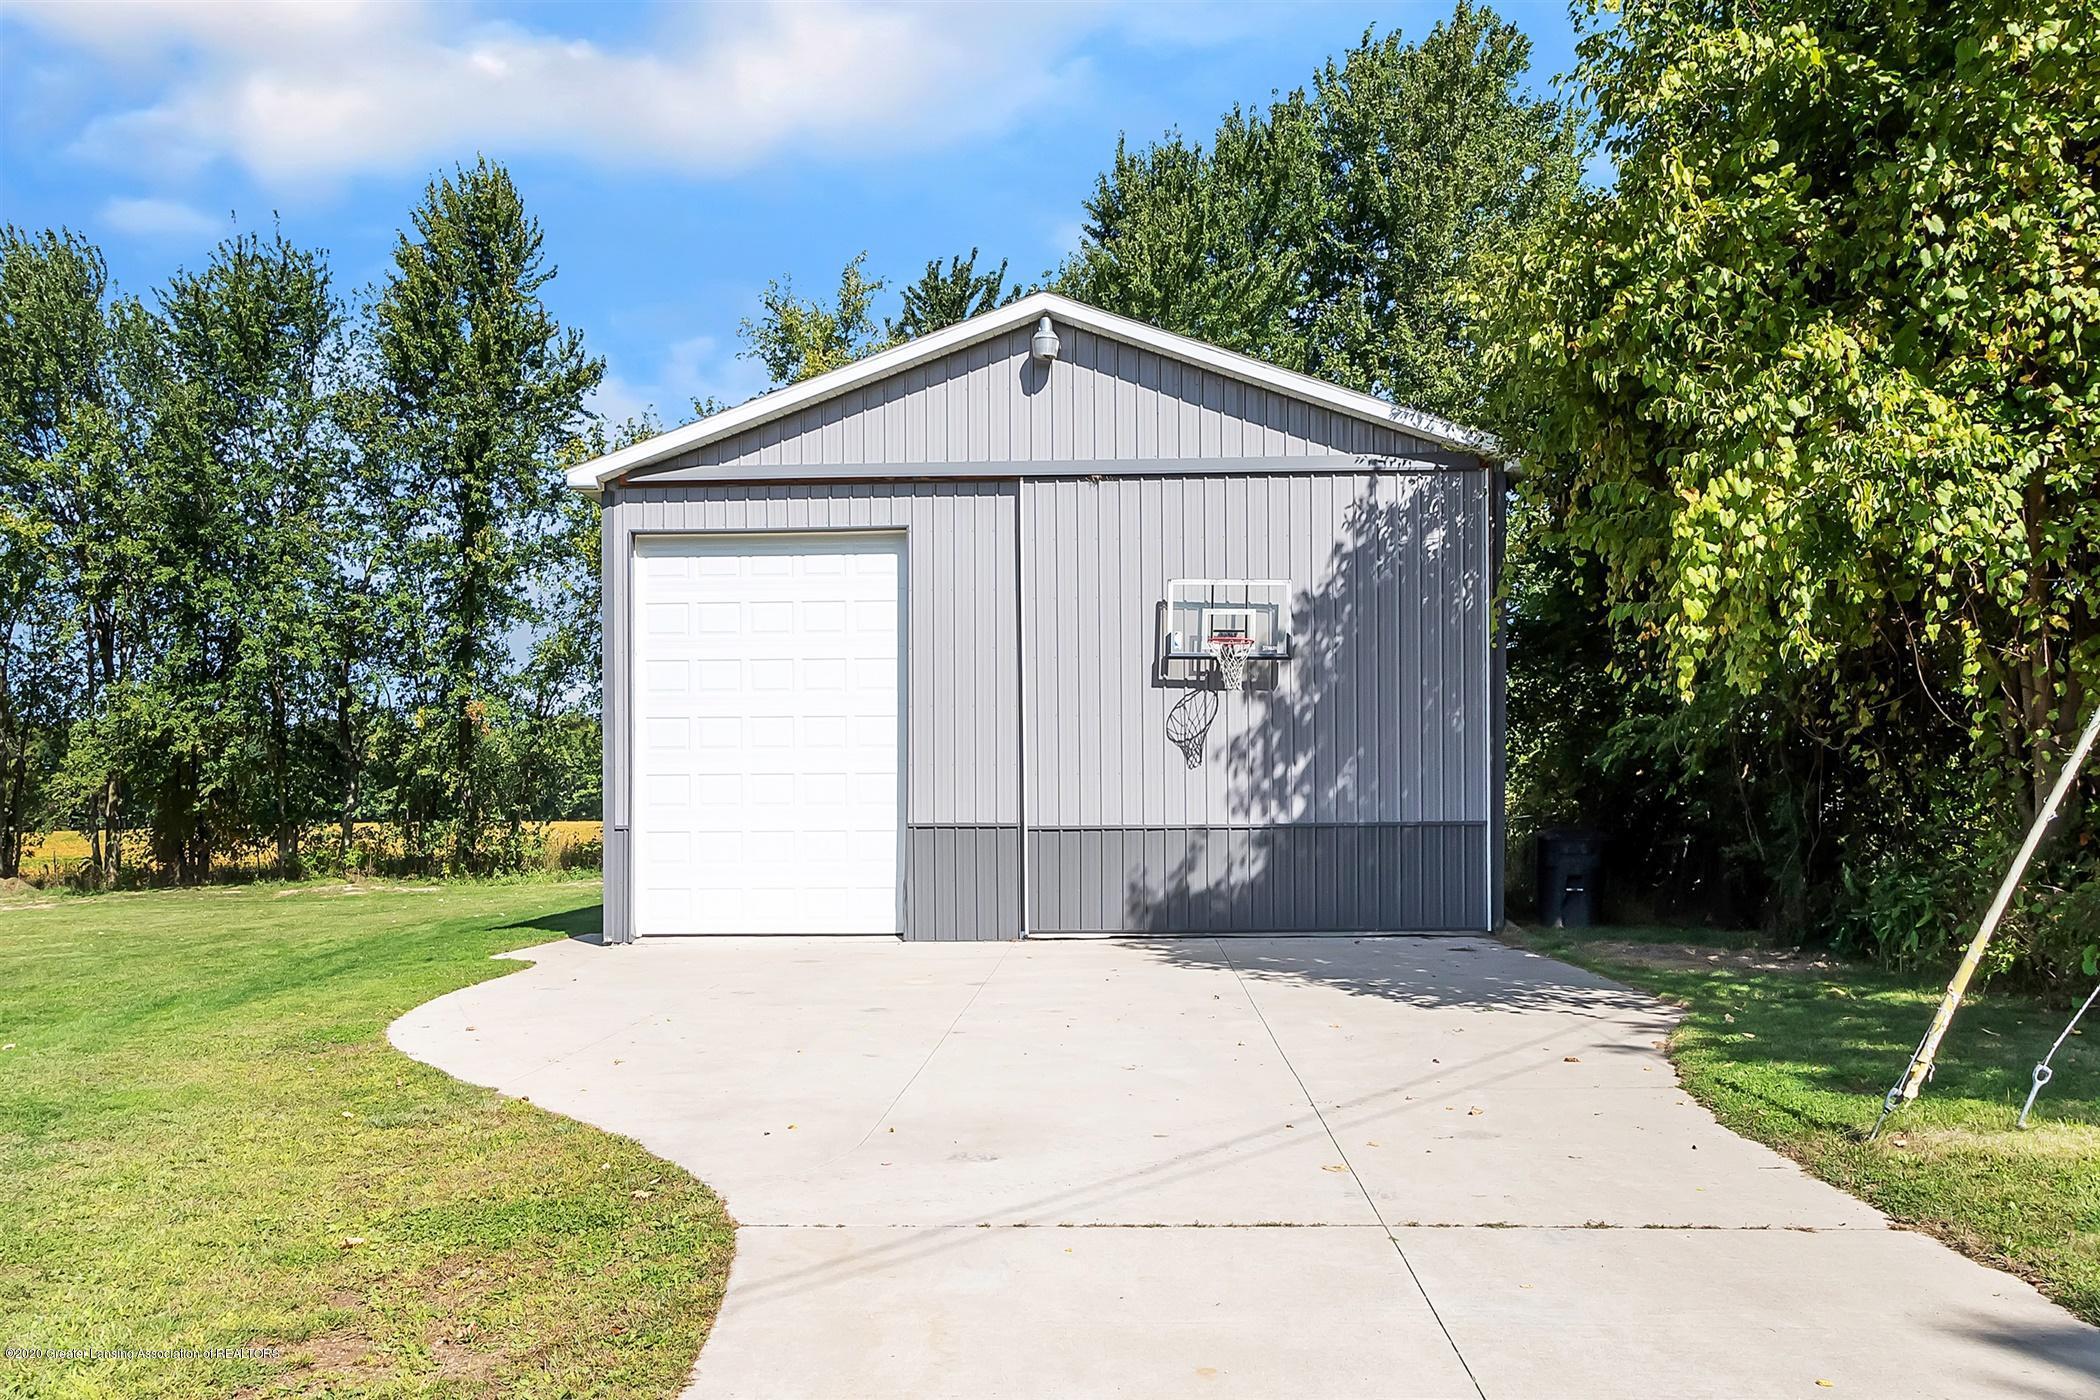 7346 W Cutler Rd - 56-7346 W Cutler Rd-WindowStill-Rea - 56